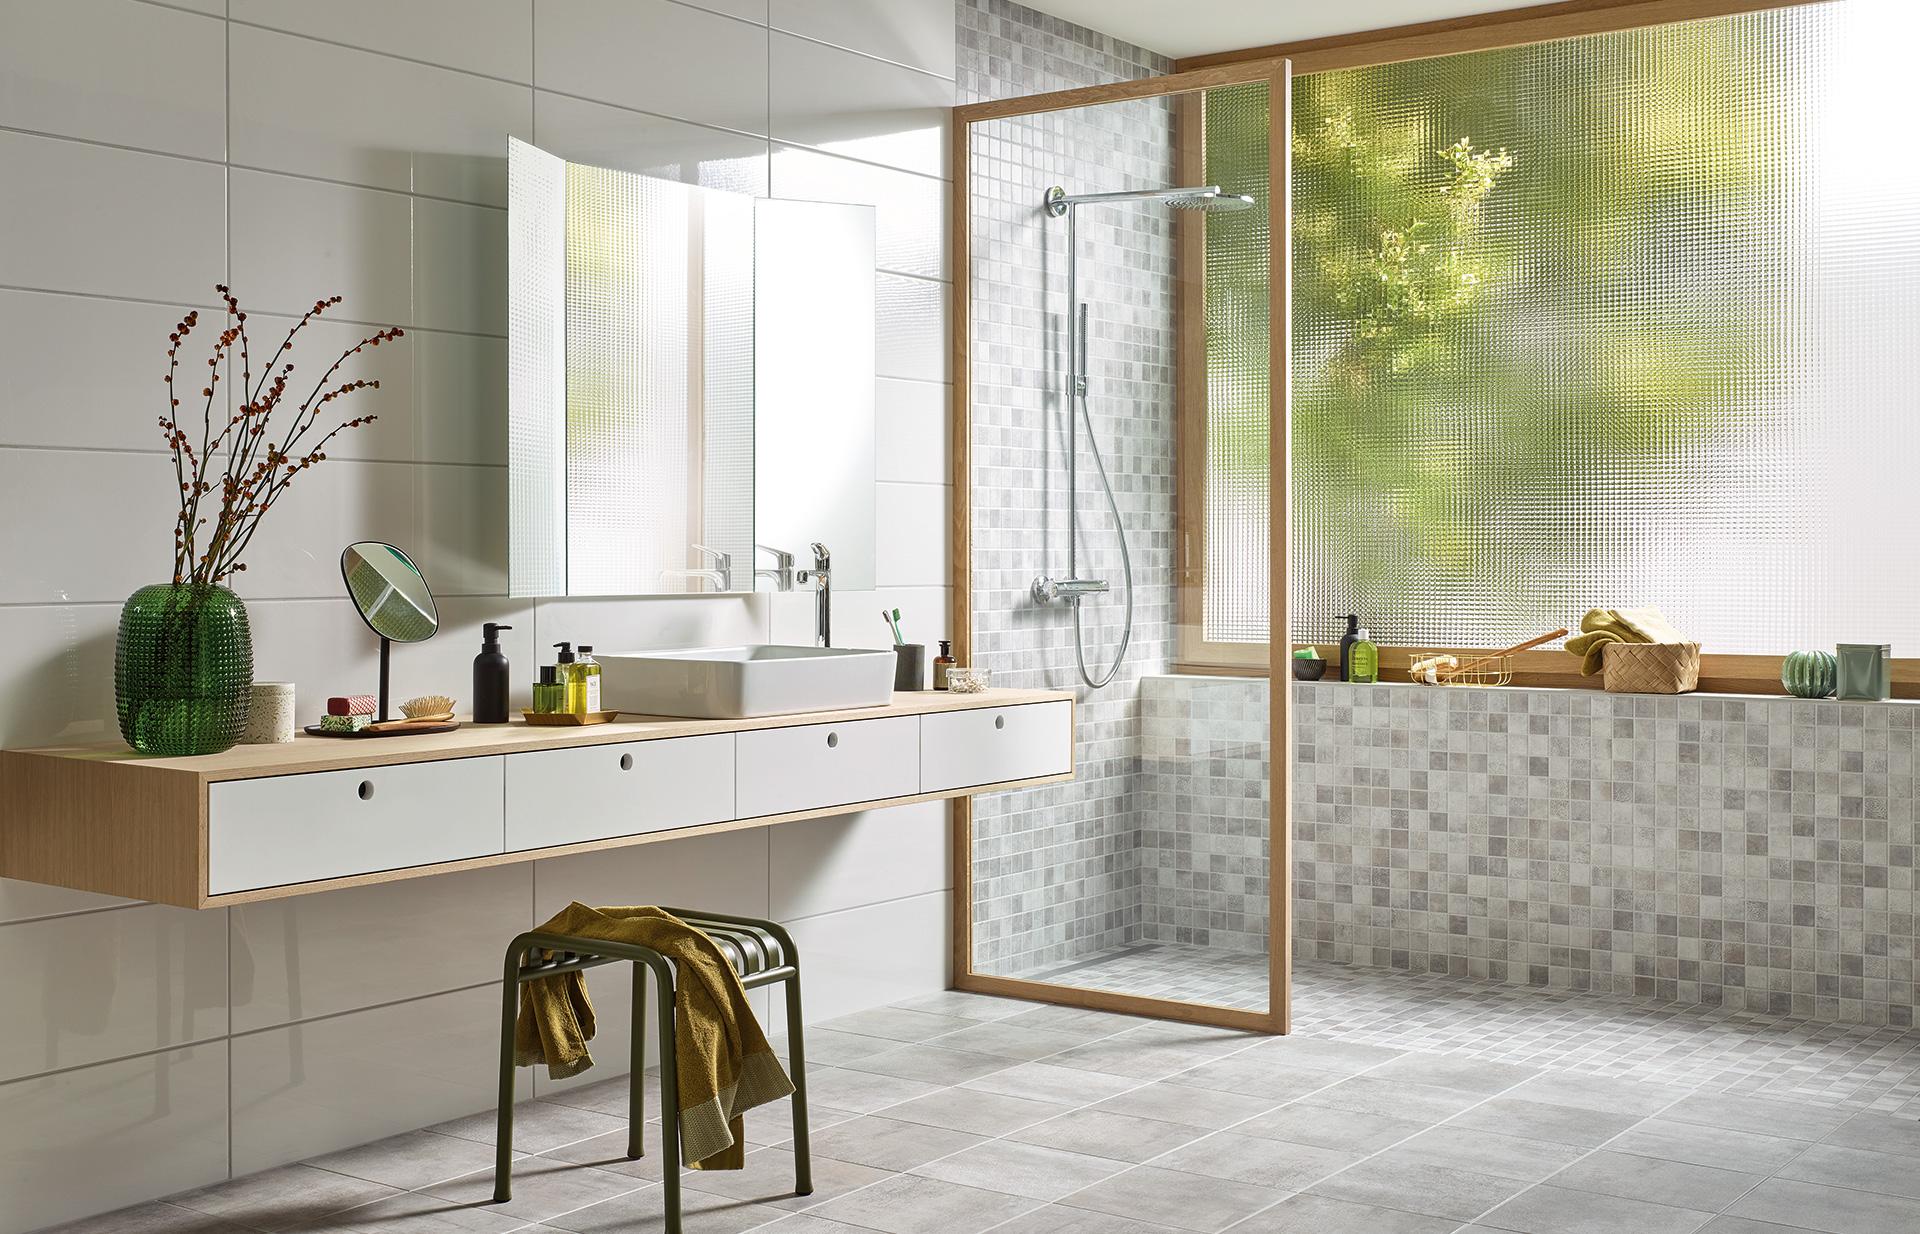 outstanding variety for individual ideas jasba fliesen. Black Bedroom Furniture Sets. Home Design Ideas